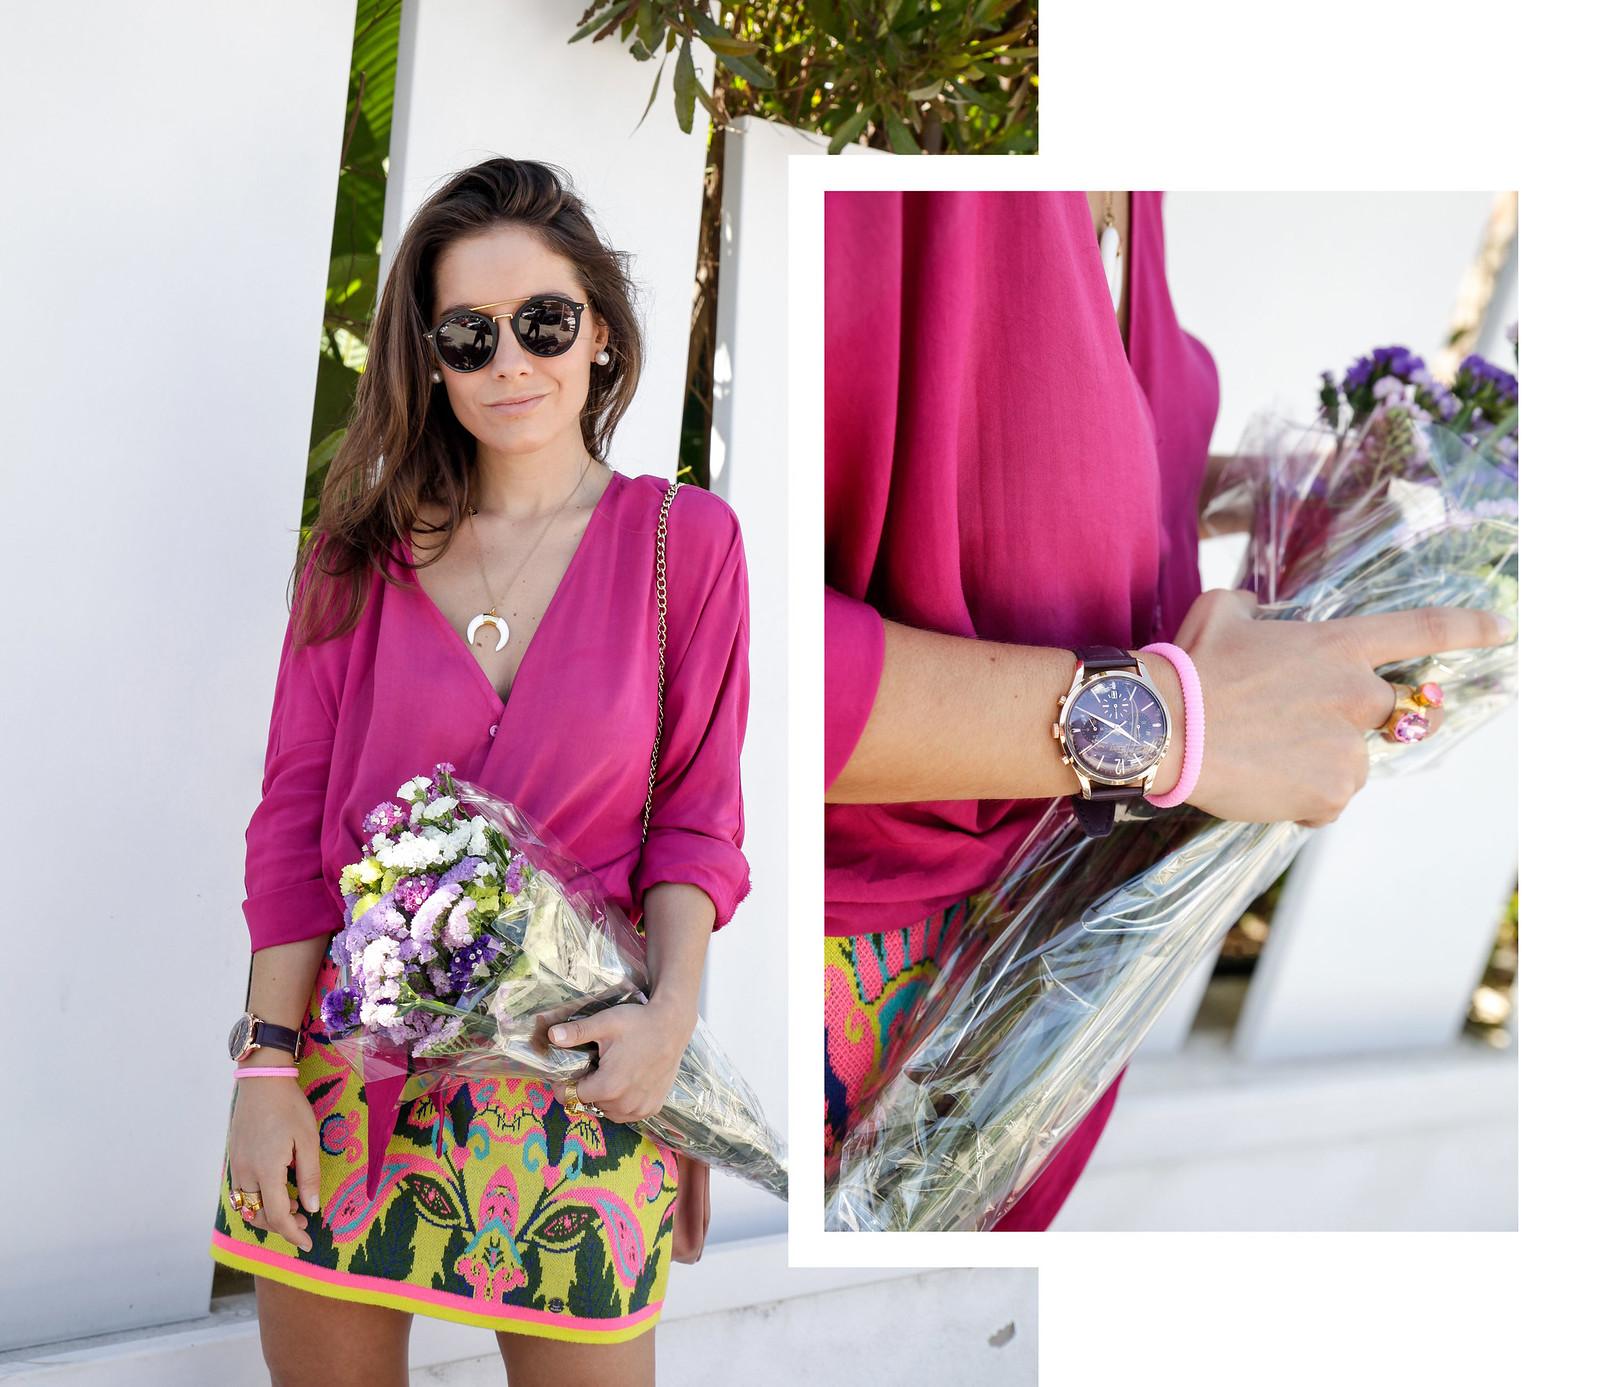 06_blusa_magenta_falda_amarilla_outfit_ruga_summer17_theguestgirl_influencer_barcelona_portugal_brand_ambassador